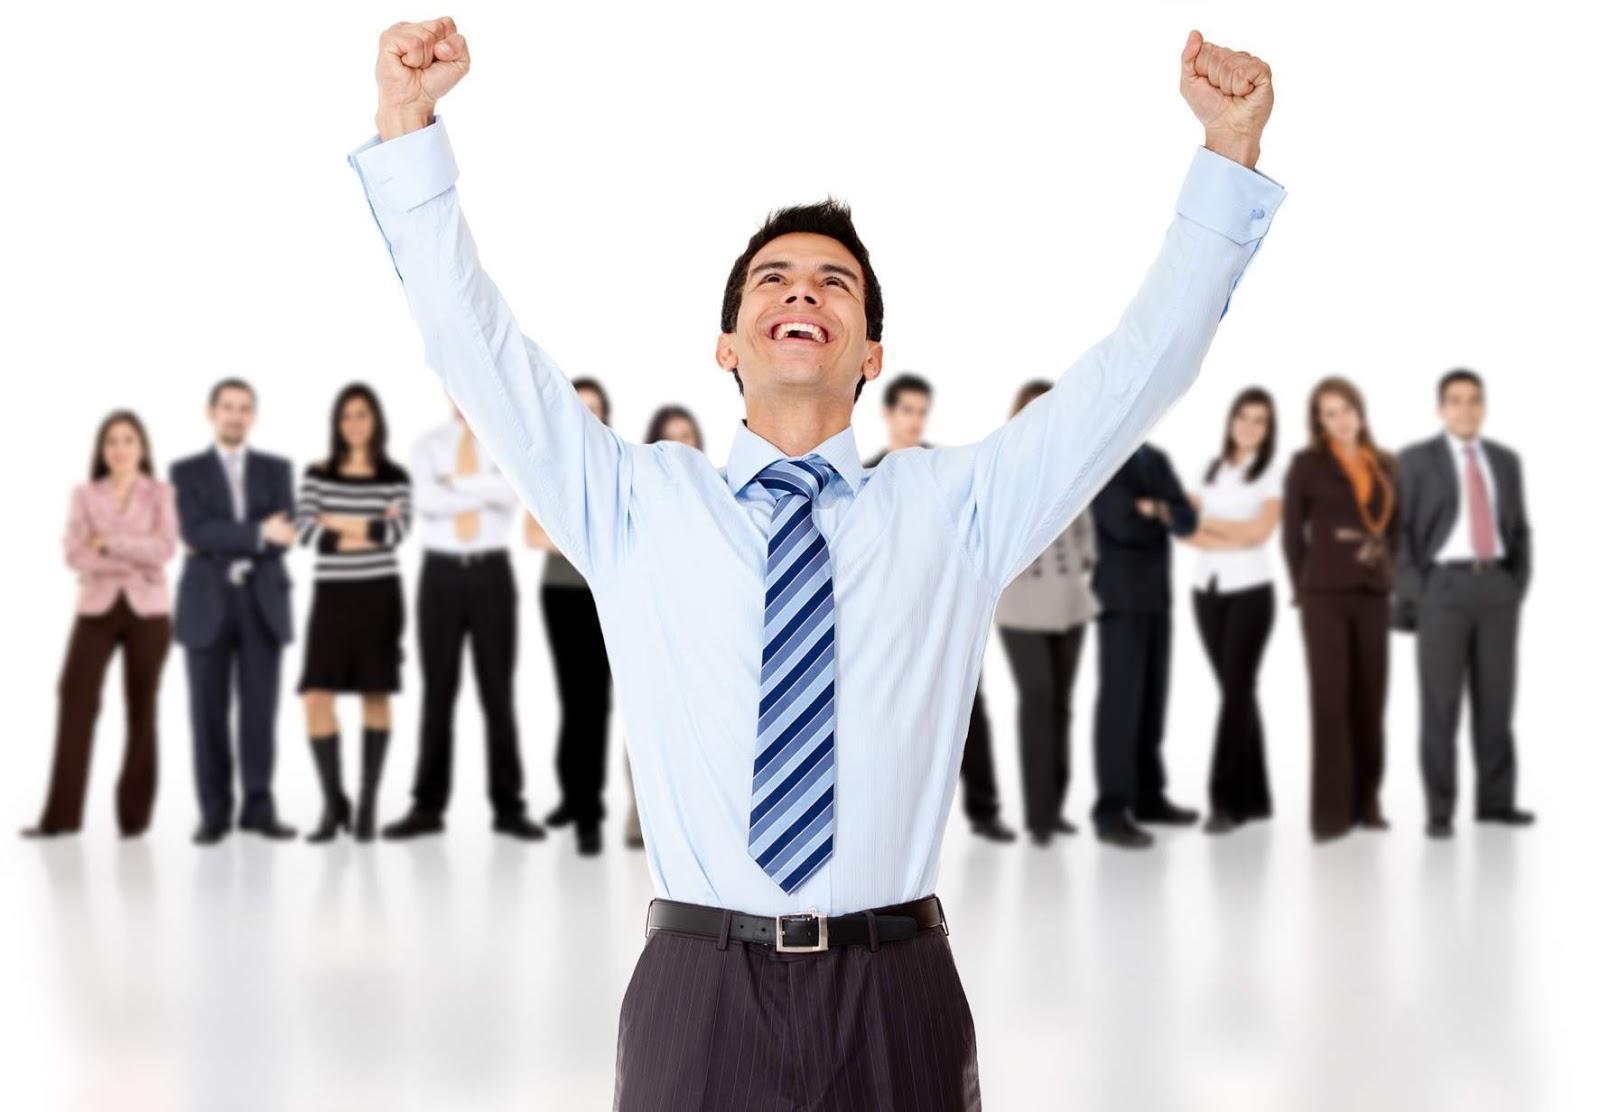 Como Transformar Seguidores Passivos em Líderes Apaixonados